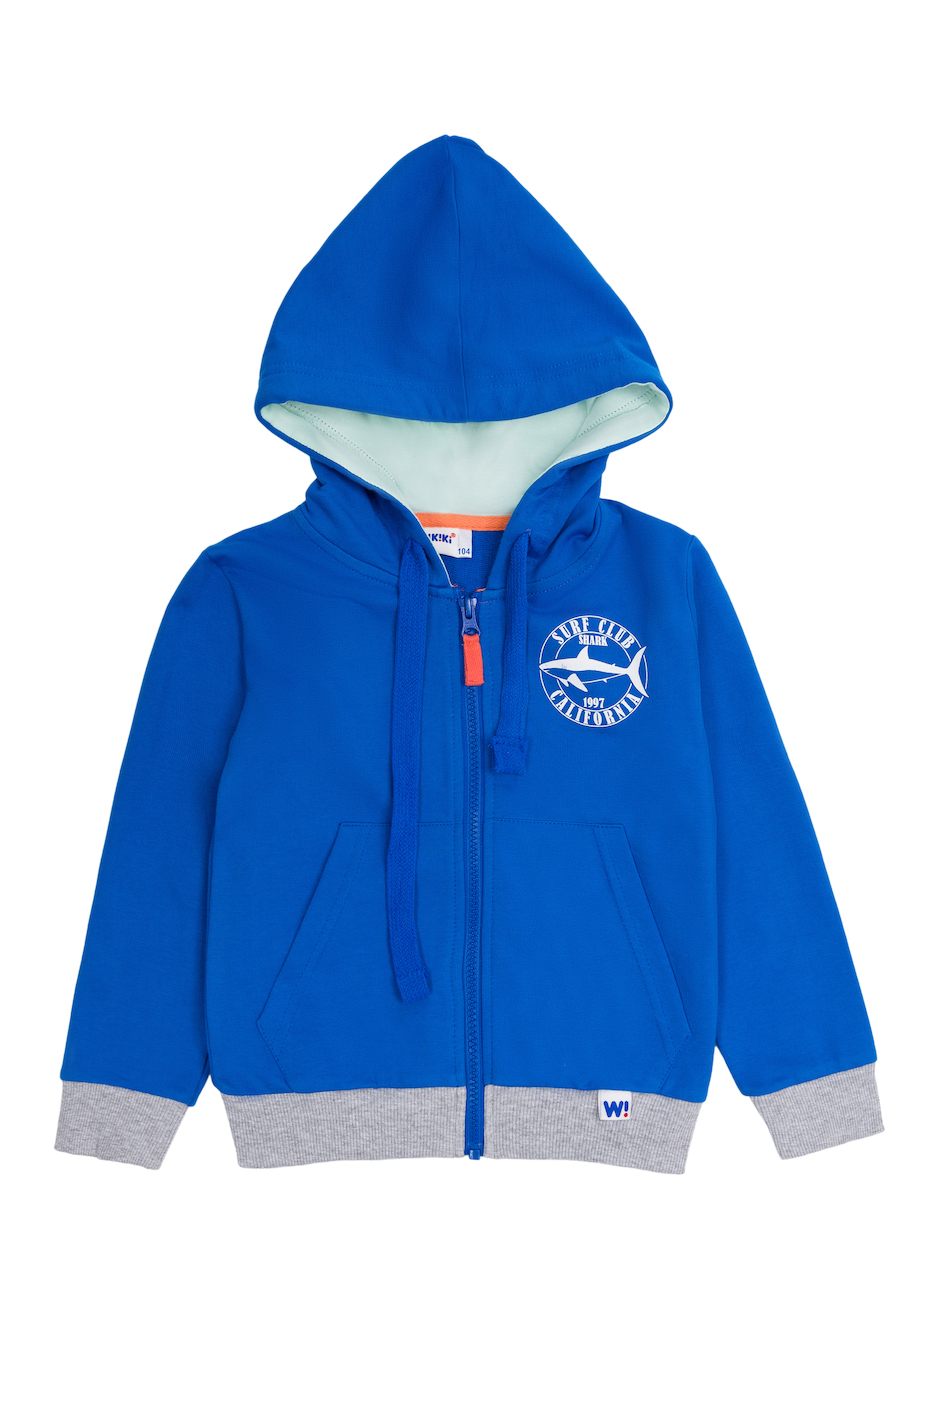 Chlapecká mikina Surf Club Modrá